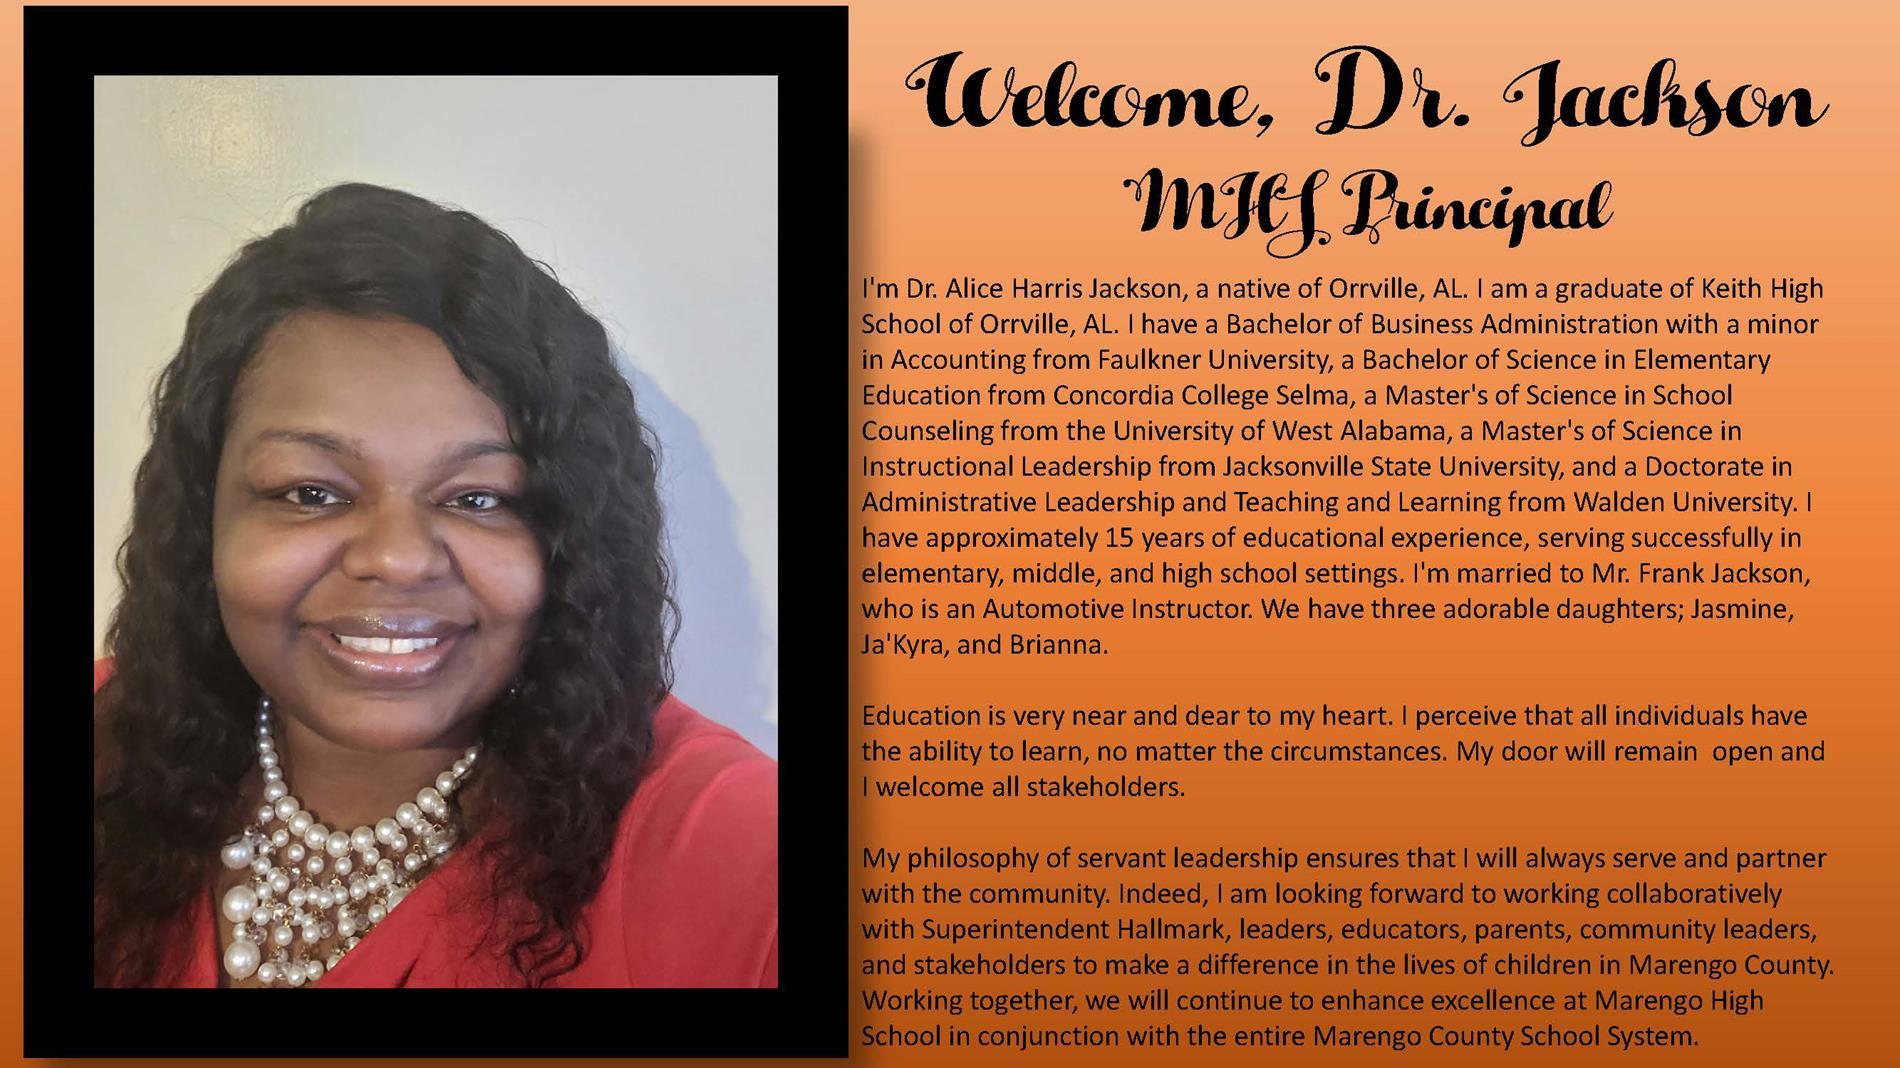 Welcome, Dr. Jackson